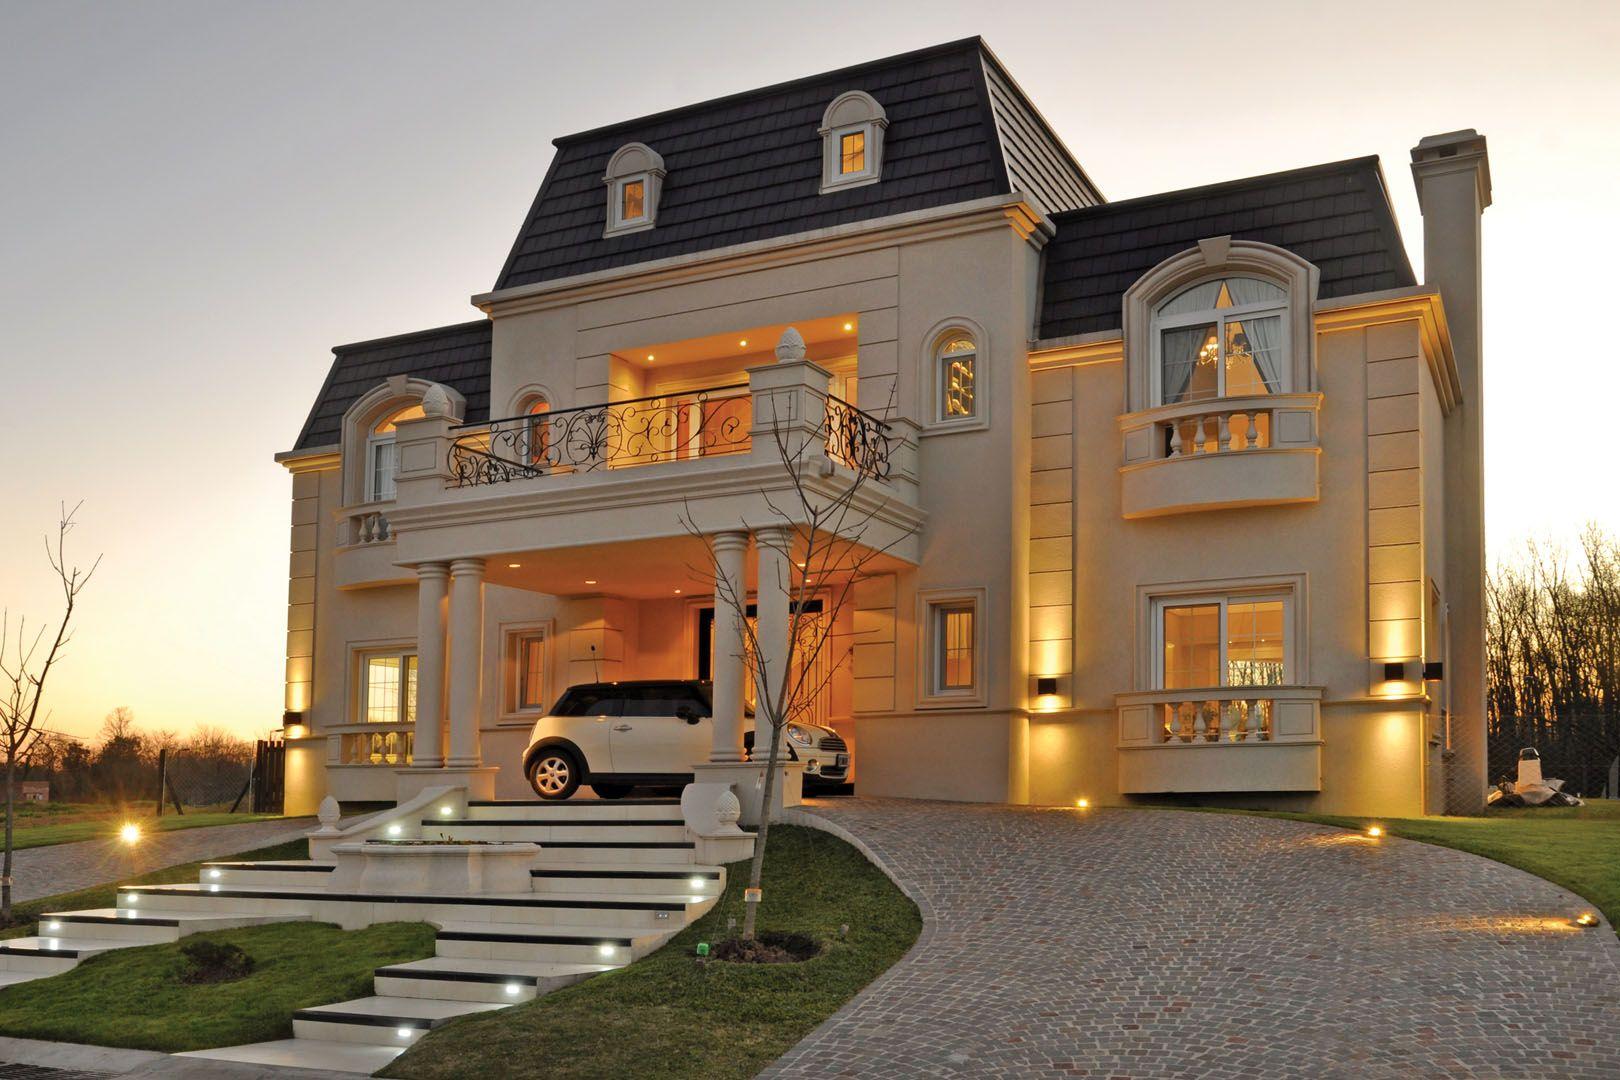 A r arquitectos house architecture and exterior - Casas estilo frances ...